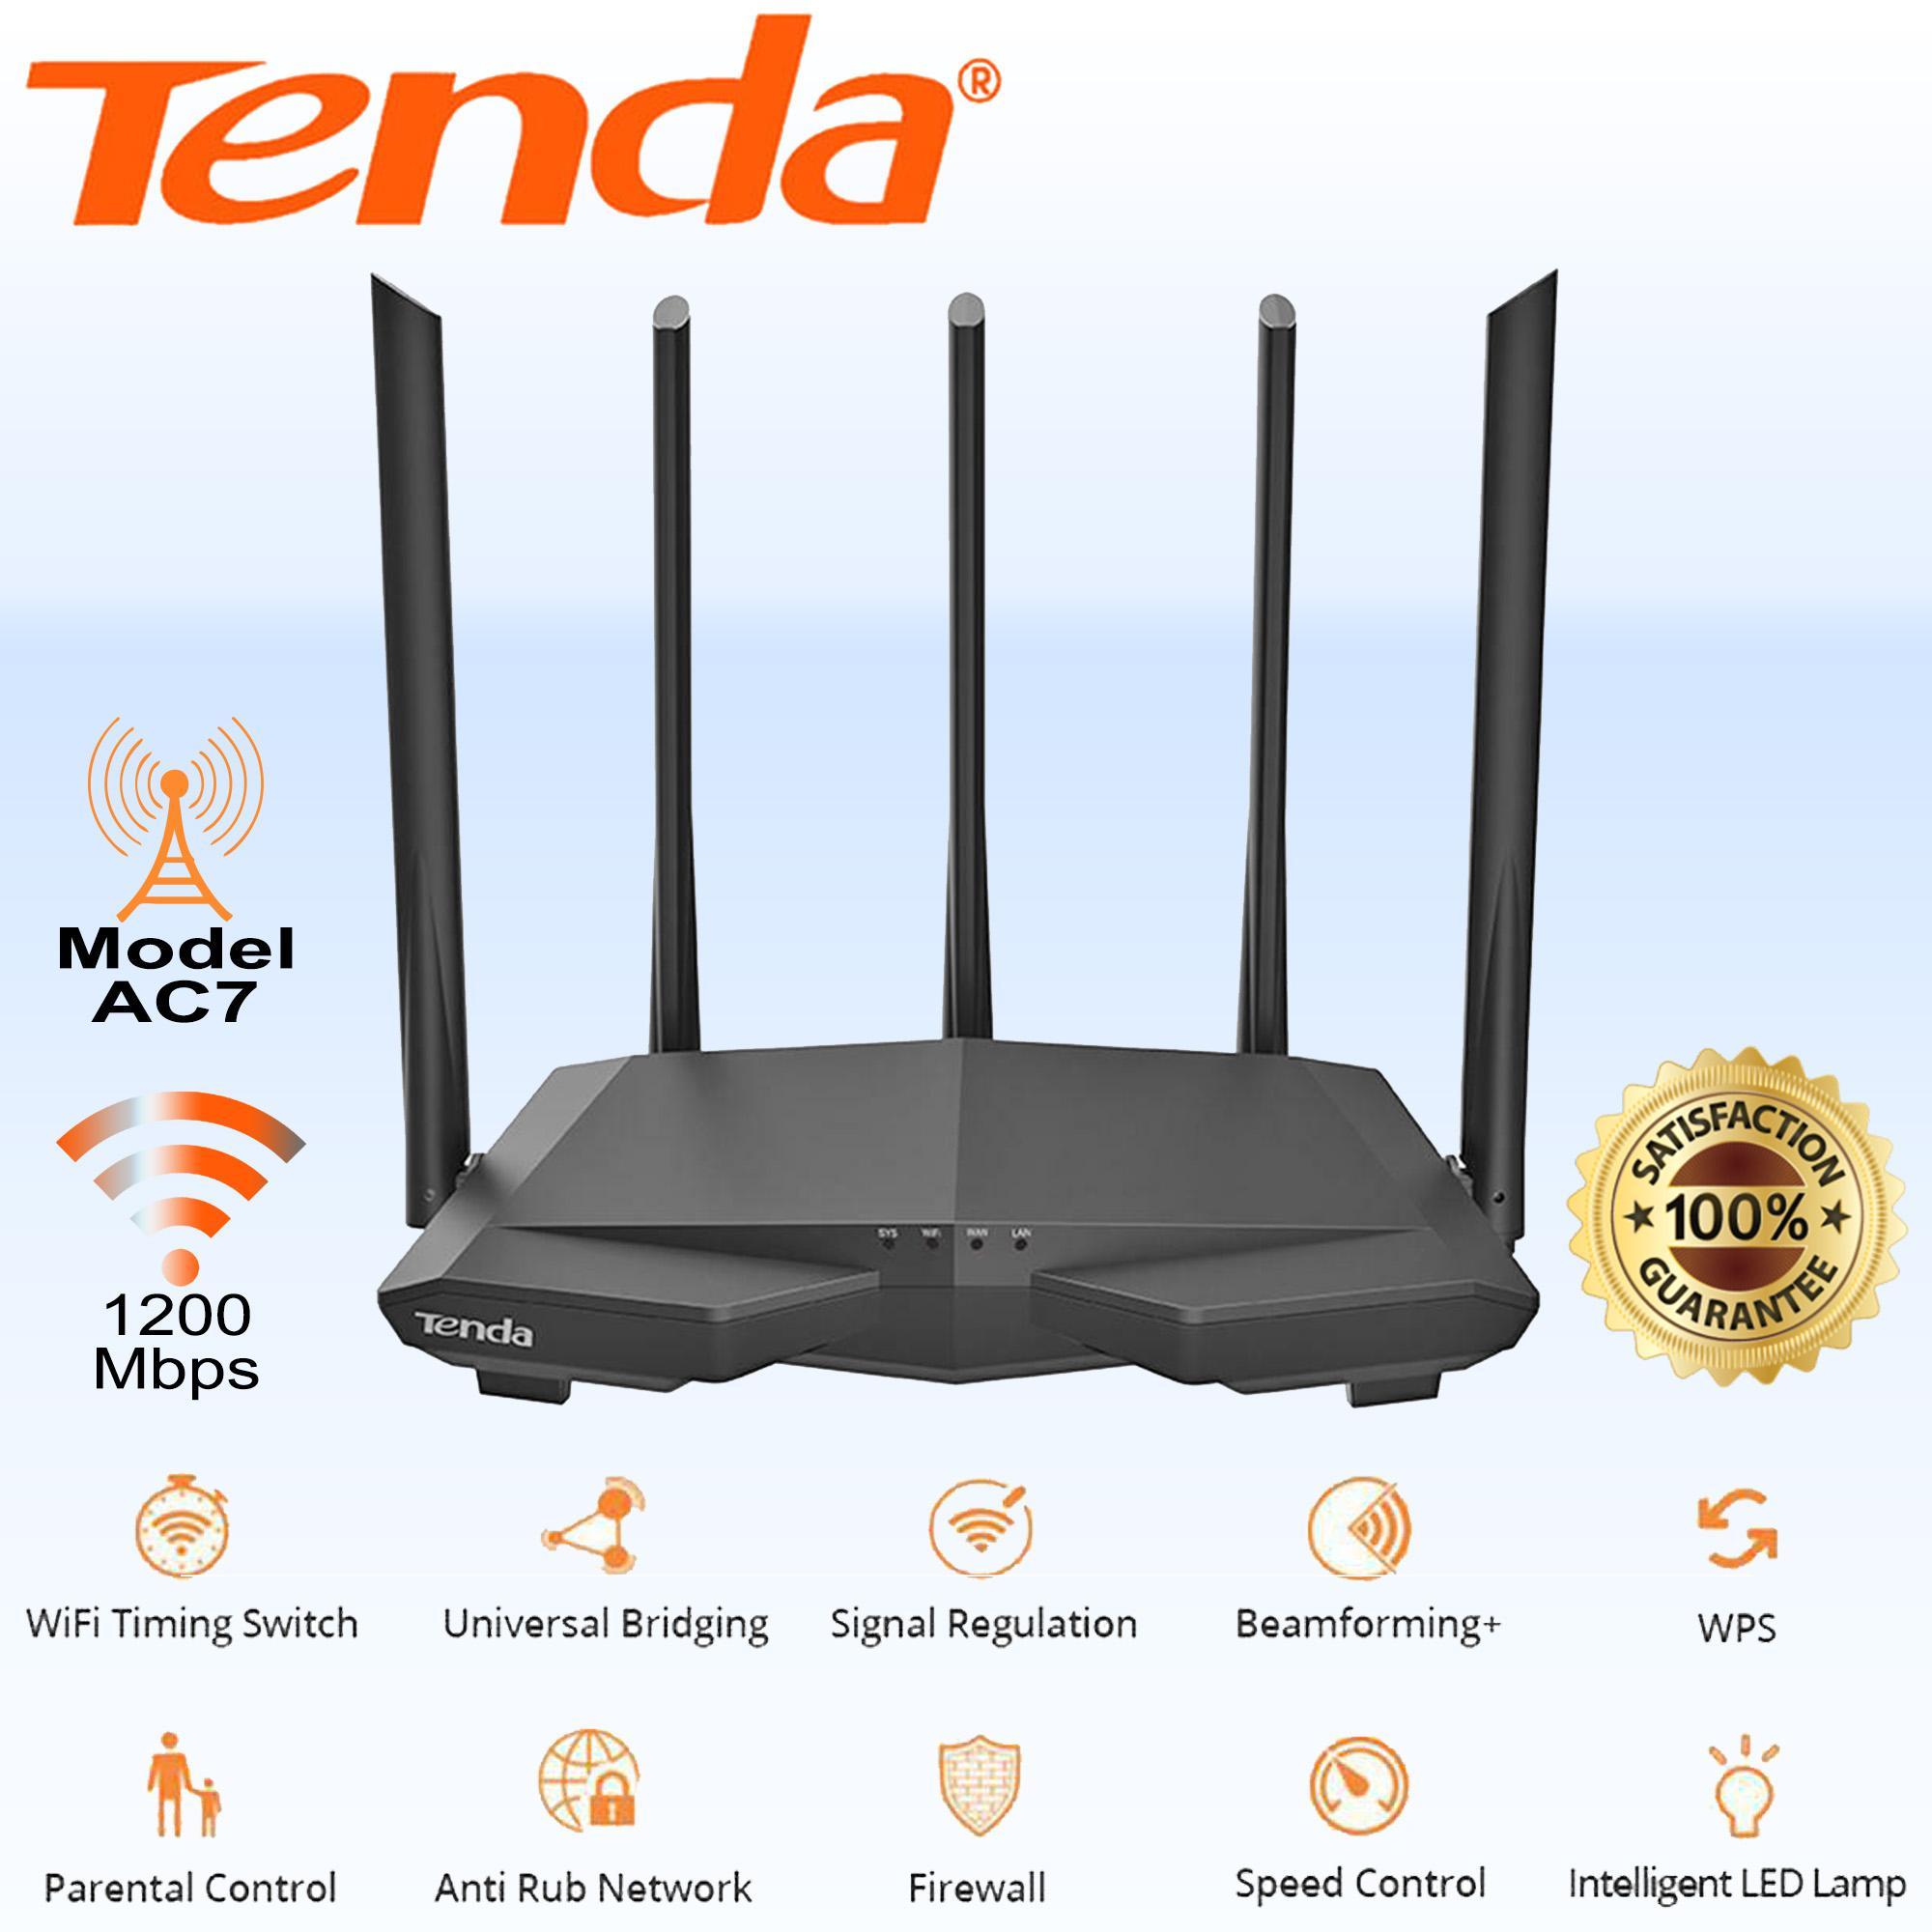 Tenda AC7 Wireless WiFi Router 1200Mbps 2 4GHz/5 0GHz 5x6dBi Antenna WiFi  Repeater Smart APP Manage